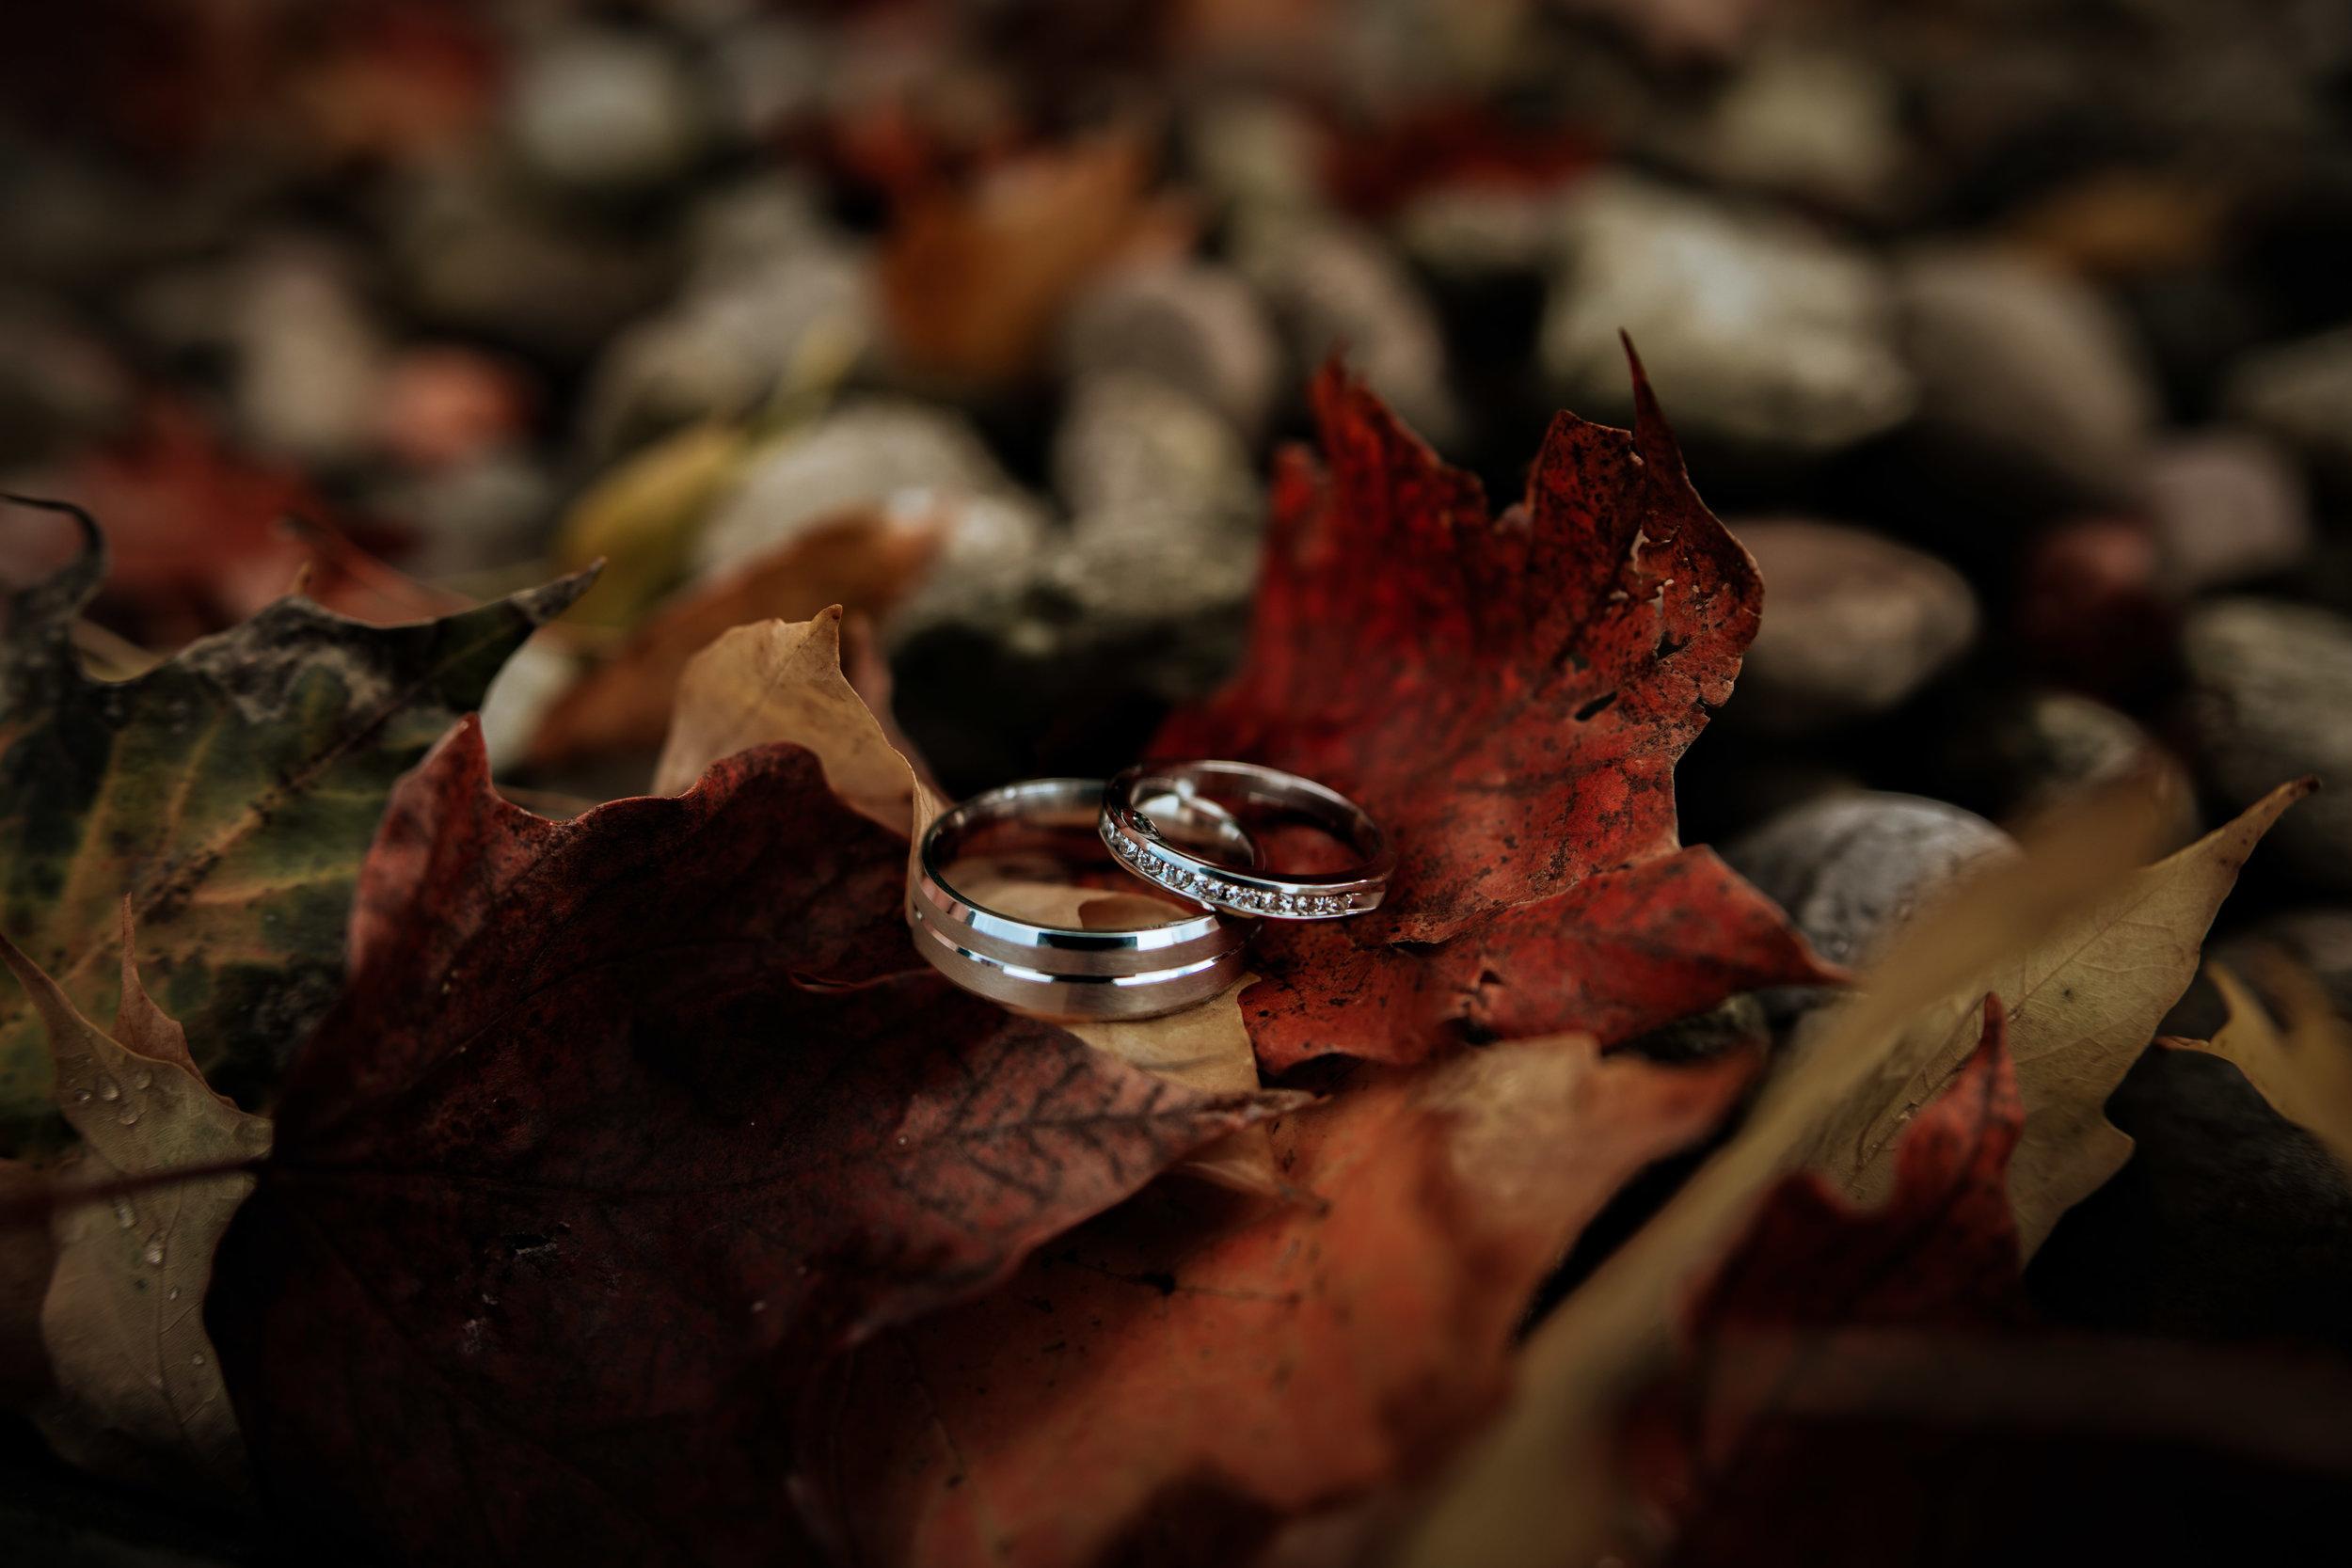 Vermont Wedding | Lorianna Weathers Photography-.jpg